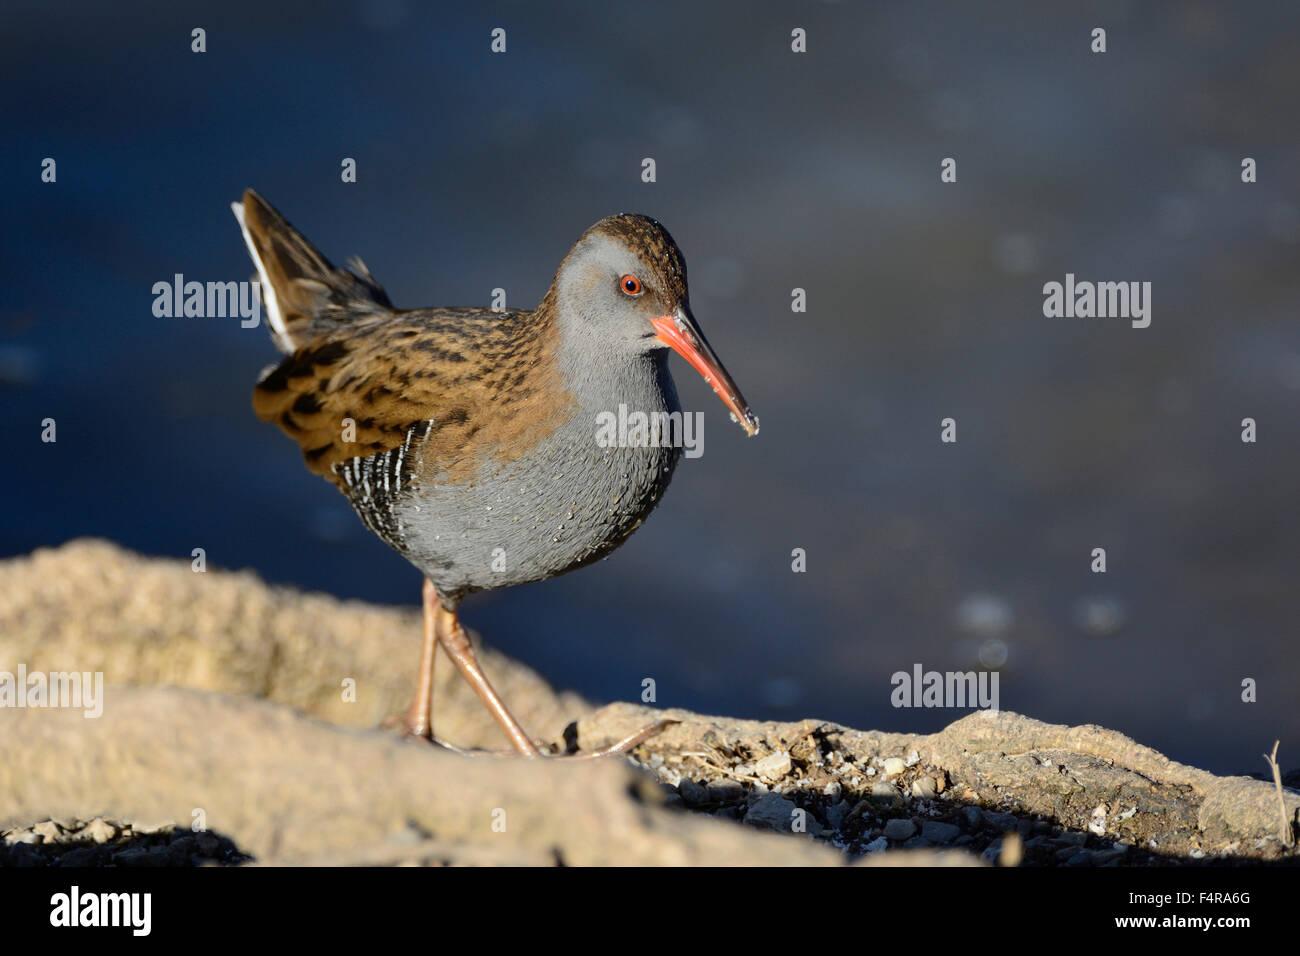 Water Rail, Rallus aquaticus, Rallidae, rail, bird, animal, Klingnau dam, . Canton of Aargau, Switzerland, Europe, - Stock Image